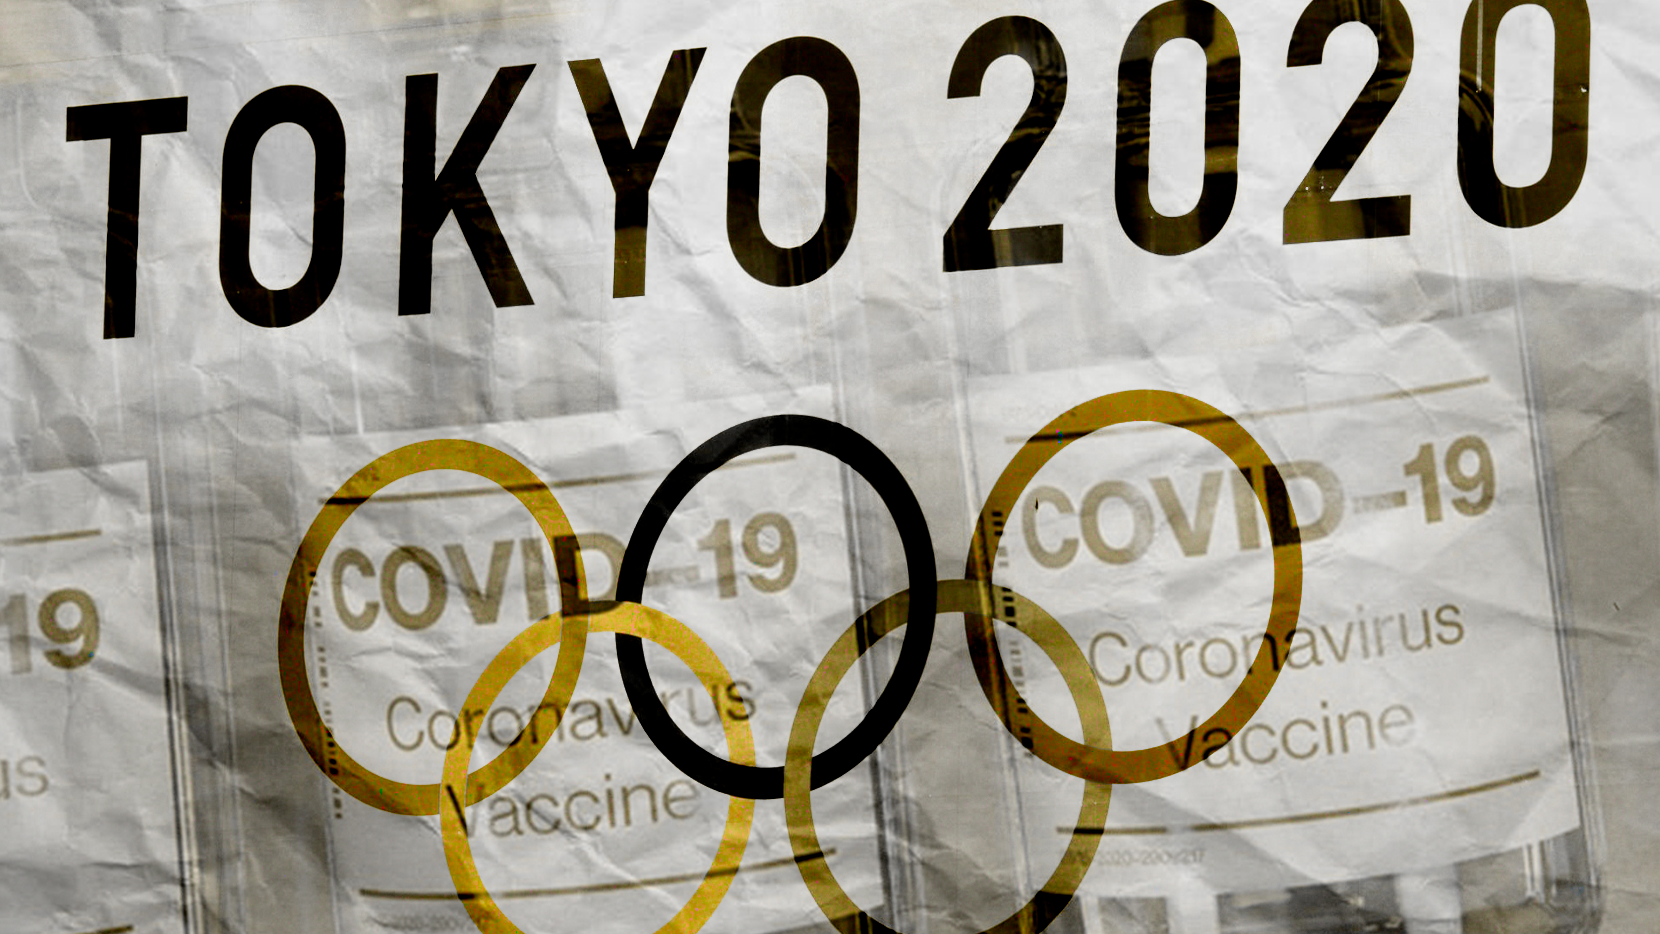 Coronavirus & The Tokyo Olympics